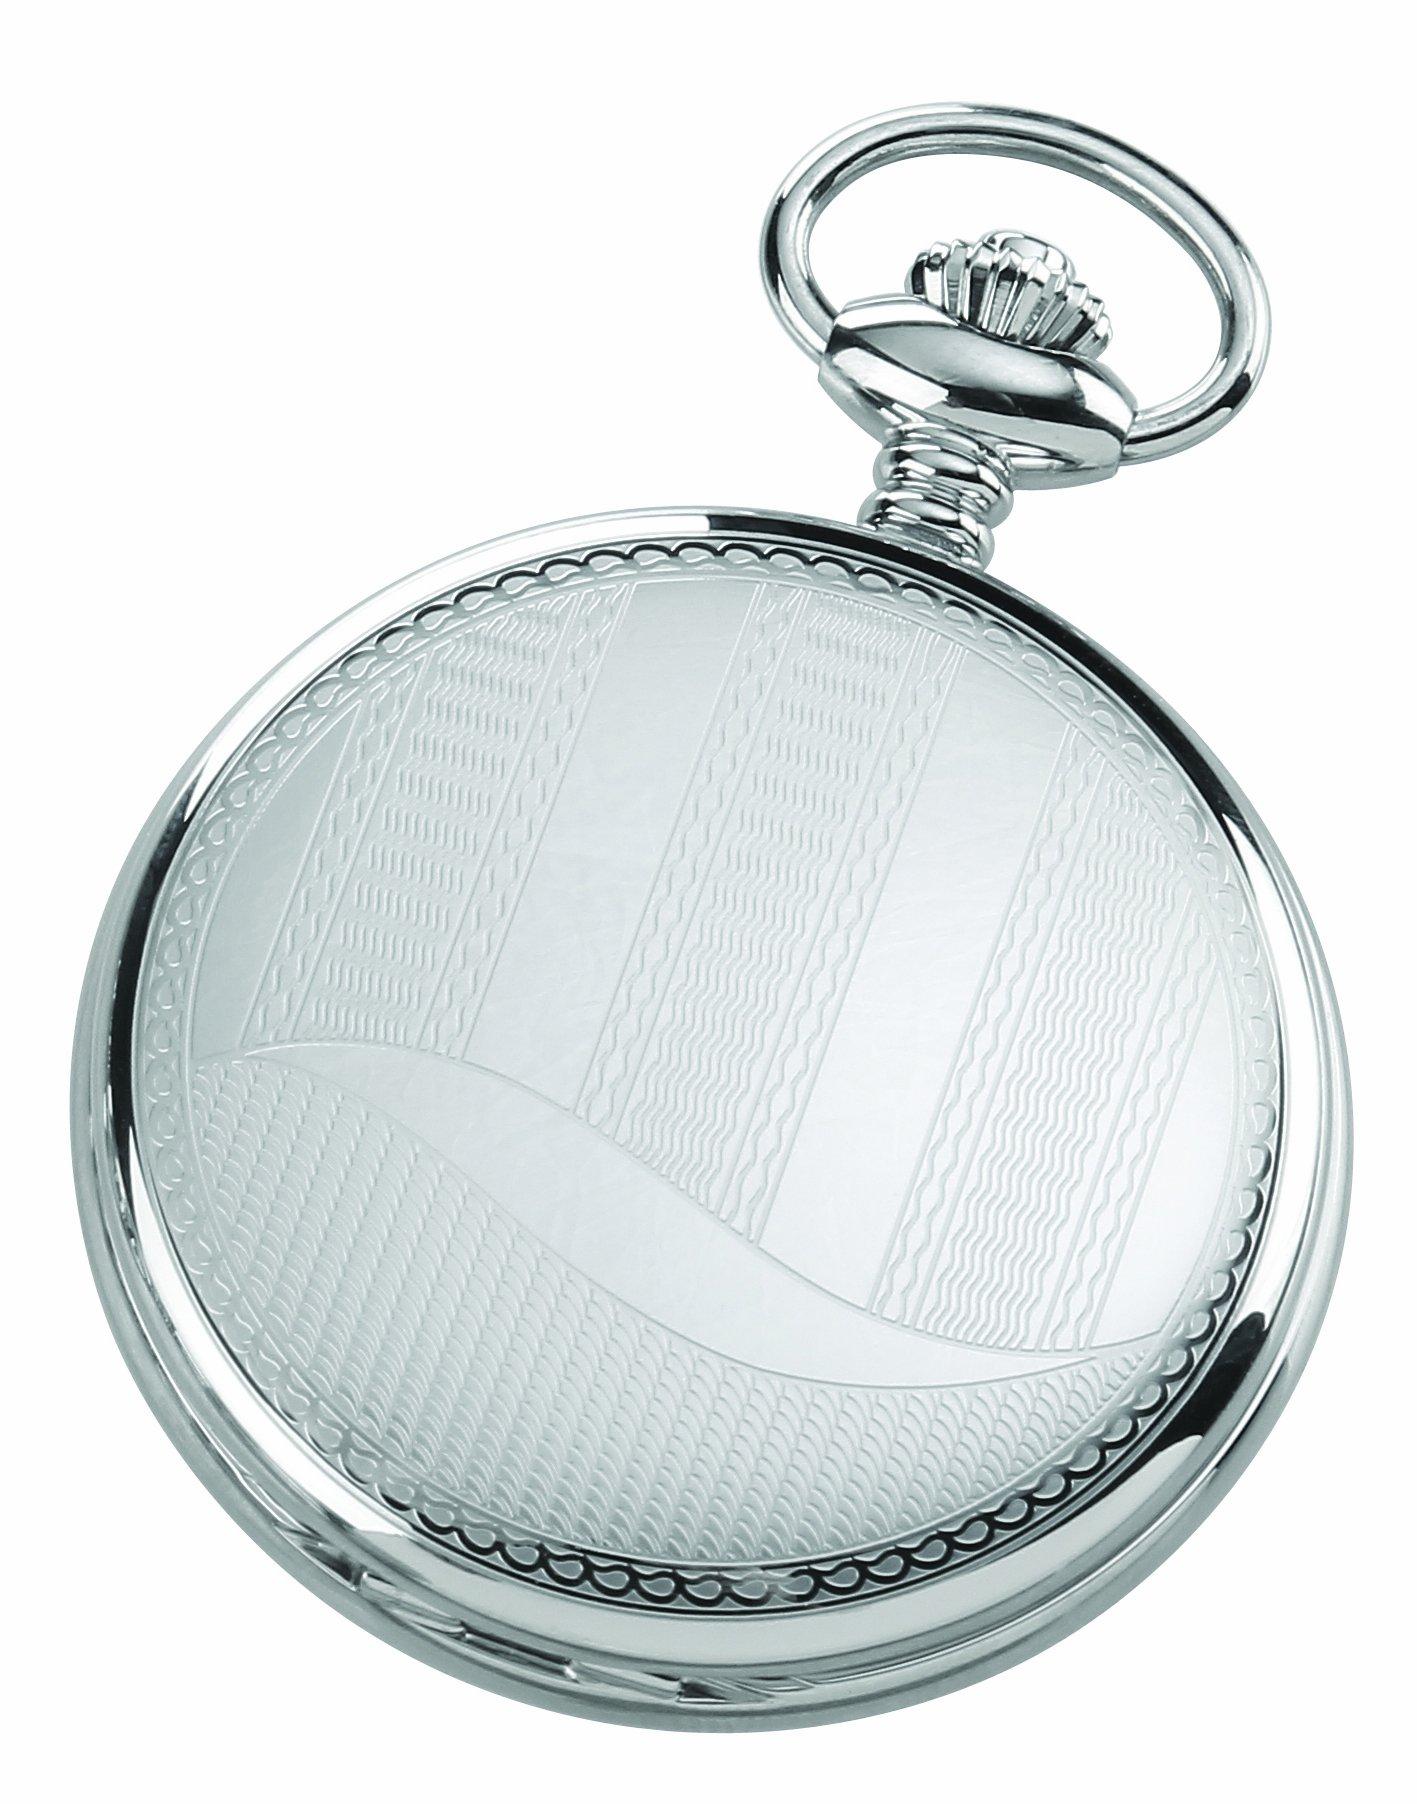 Charles-Hubert, Paris 3914 Premium Collection Analog Display Quartz Pocket Watch